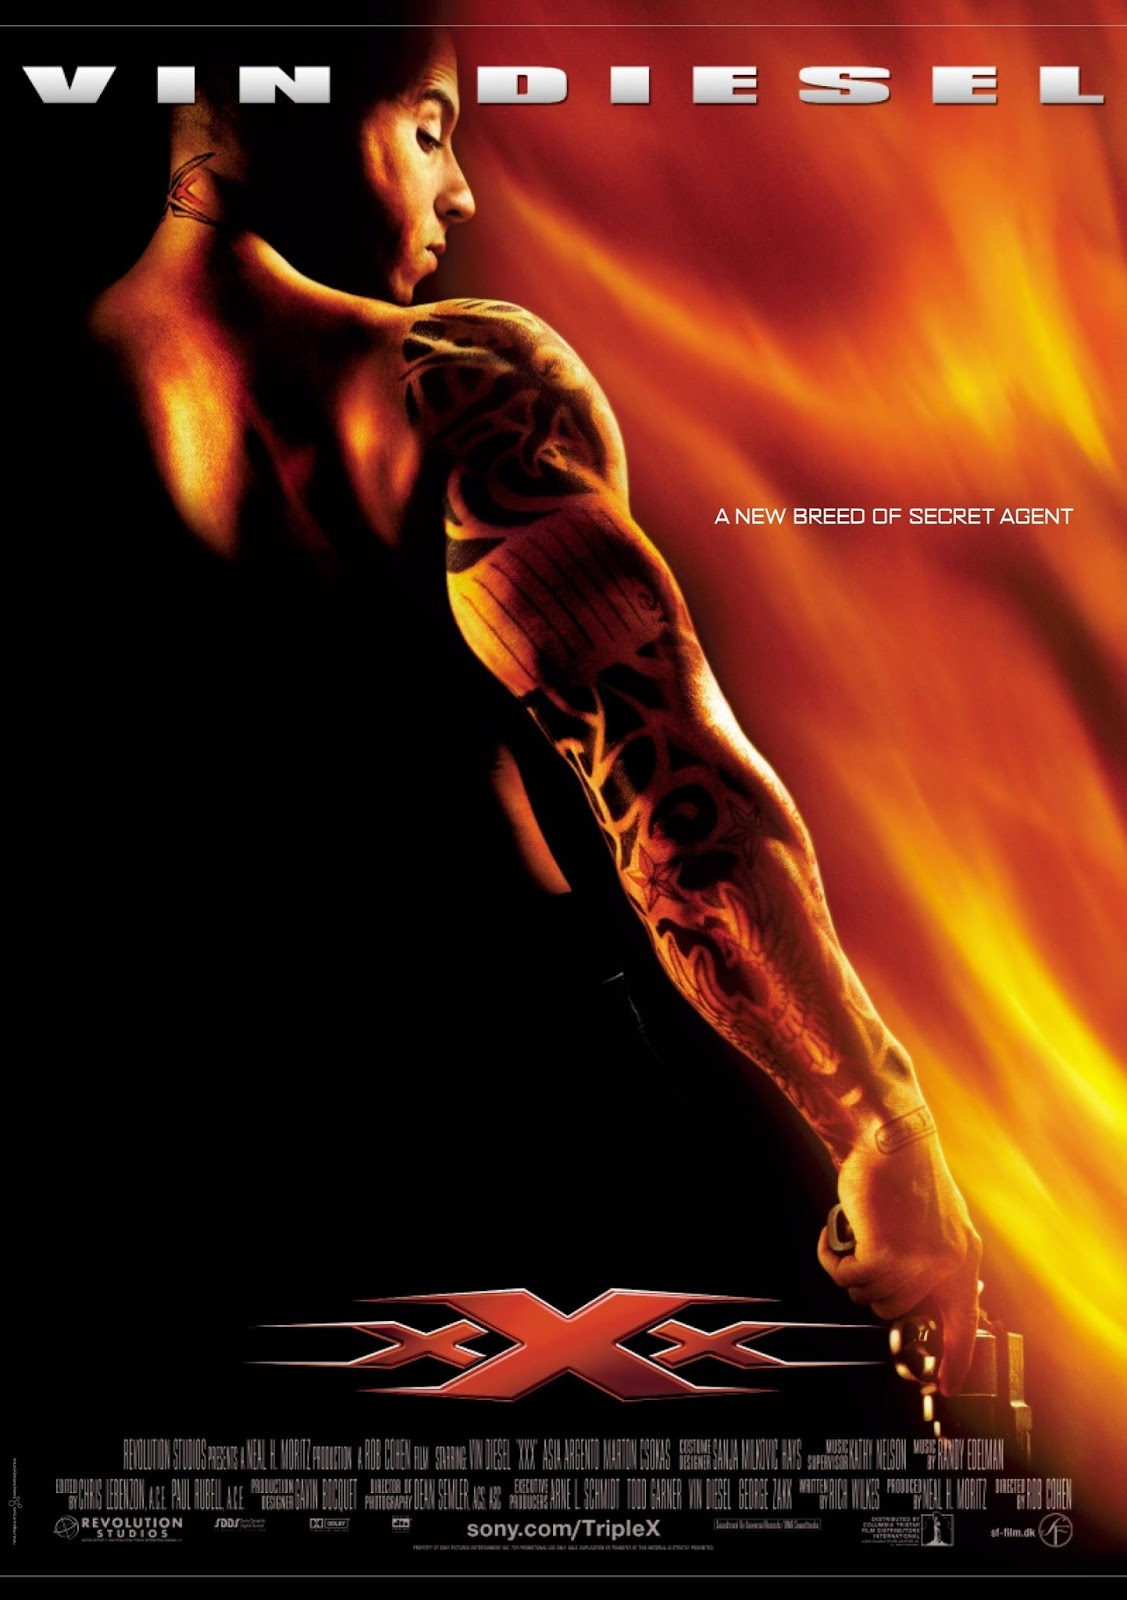 xXx (2002) [15th Anniversary Edition] ทริปเปิ้ลเอ็กซ์ พยัคฆ์ร้ายพันธุ์ดุ